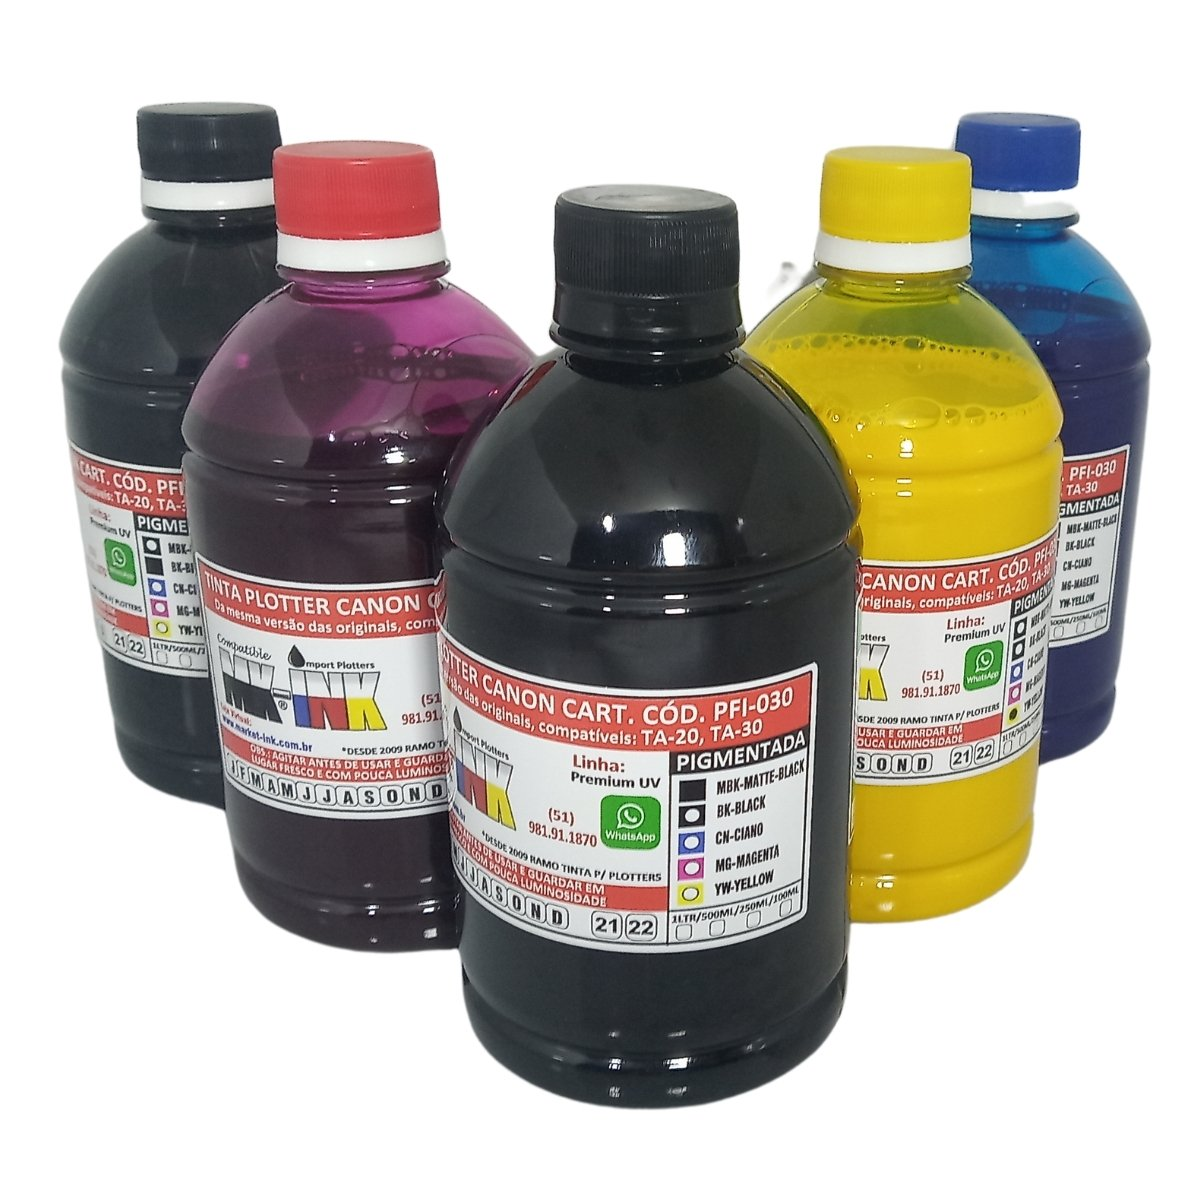 Jogo 5x100ml Tintas Pigmentada Premium Compatível Plotters Canon Ta-20 Ta-30 que utilizam cartuchos códigos PFI-030